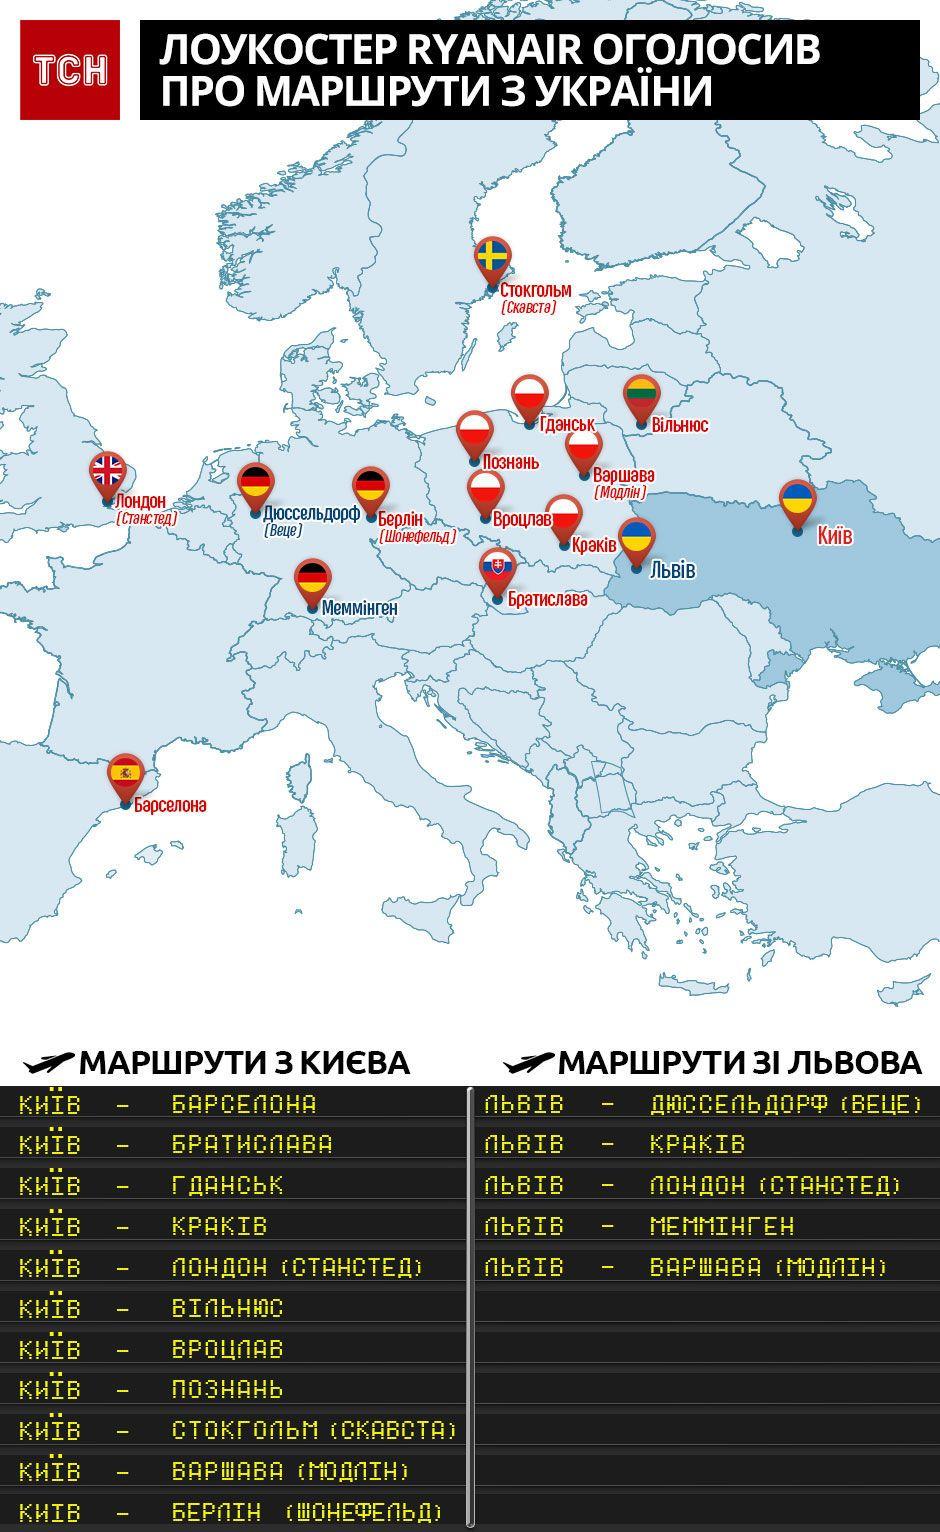 ryanair, україна, інфографіка